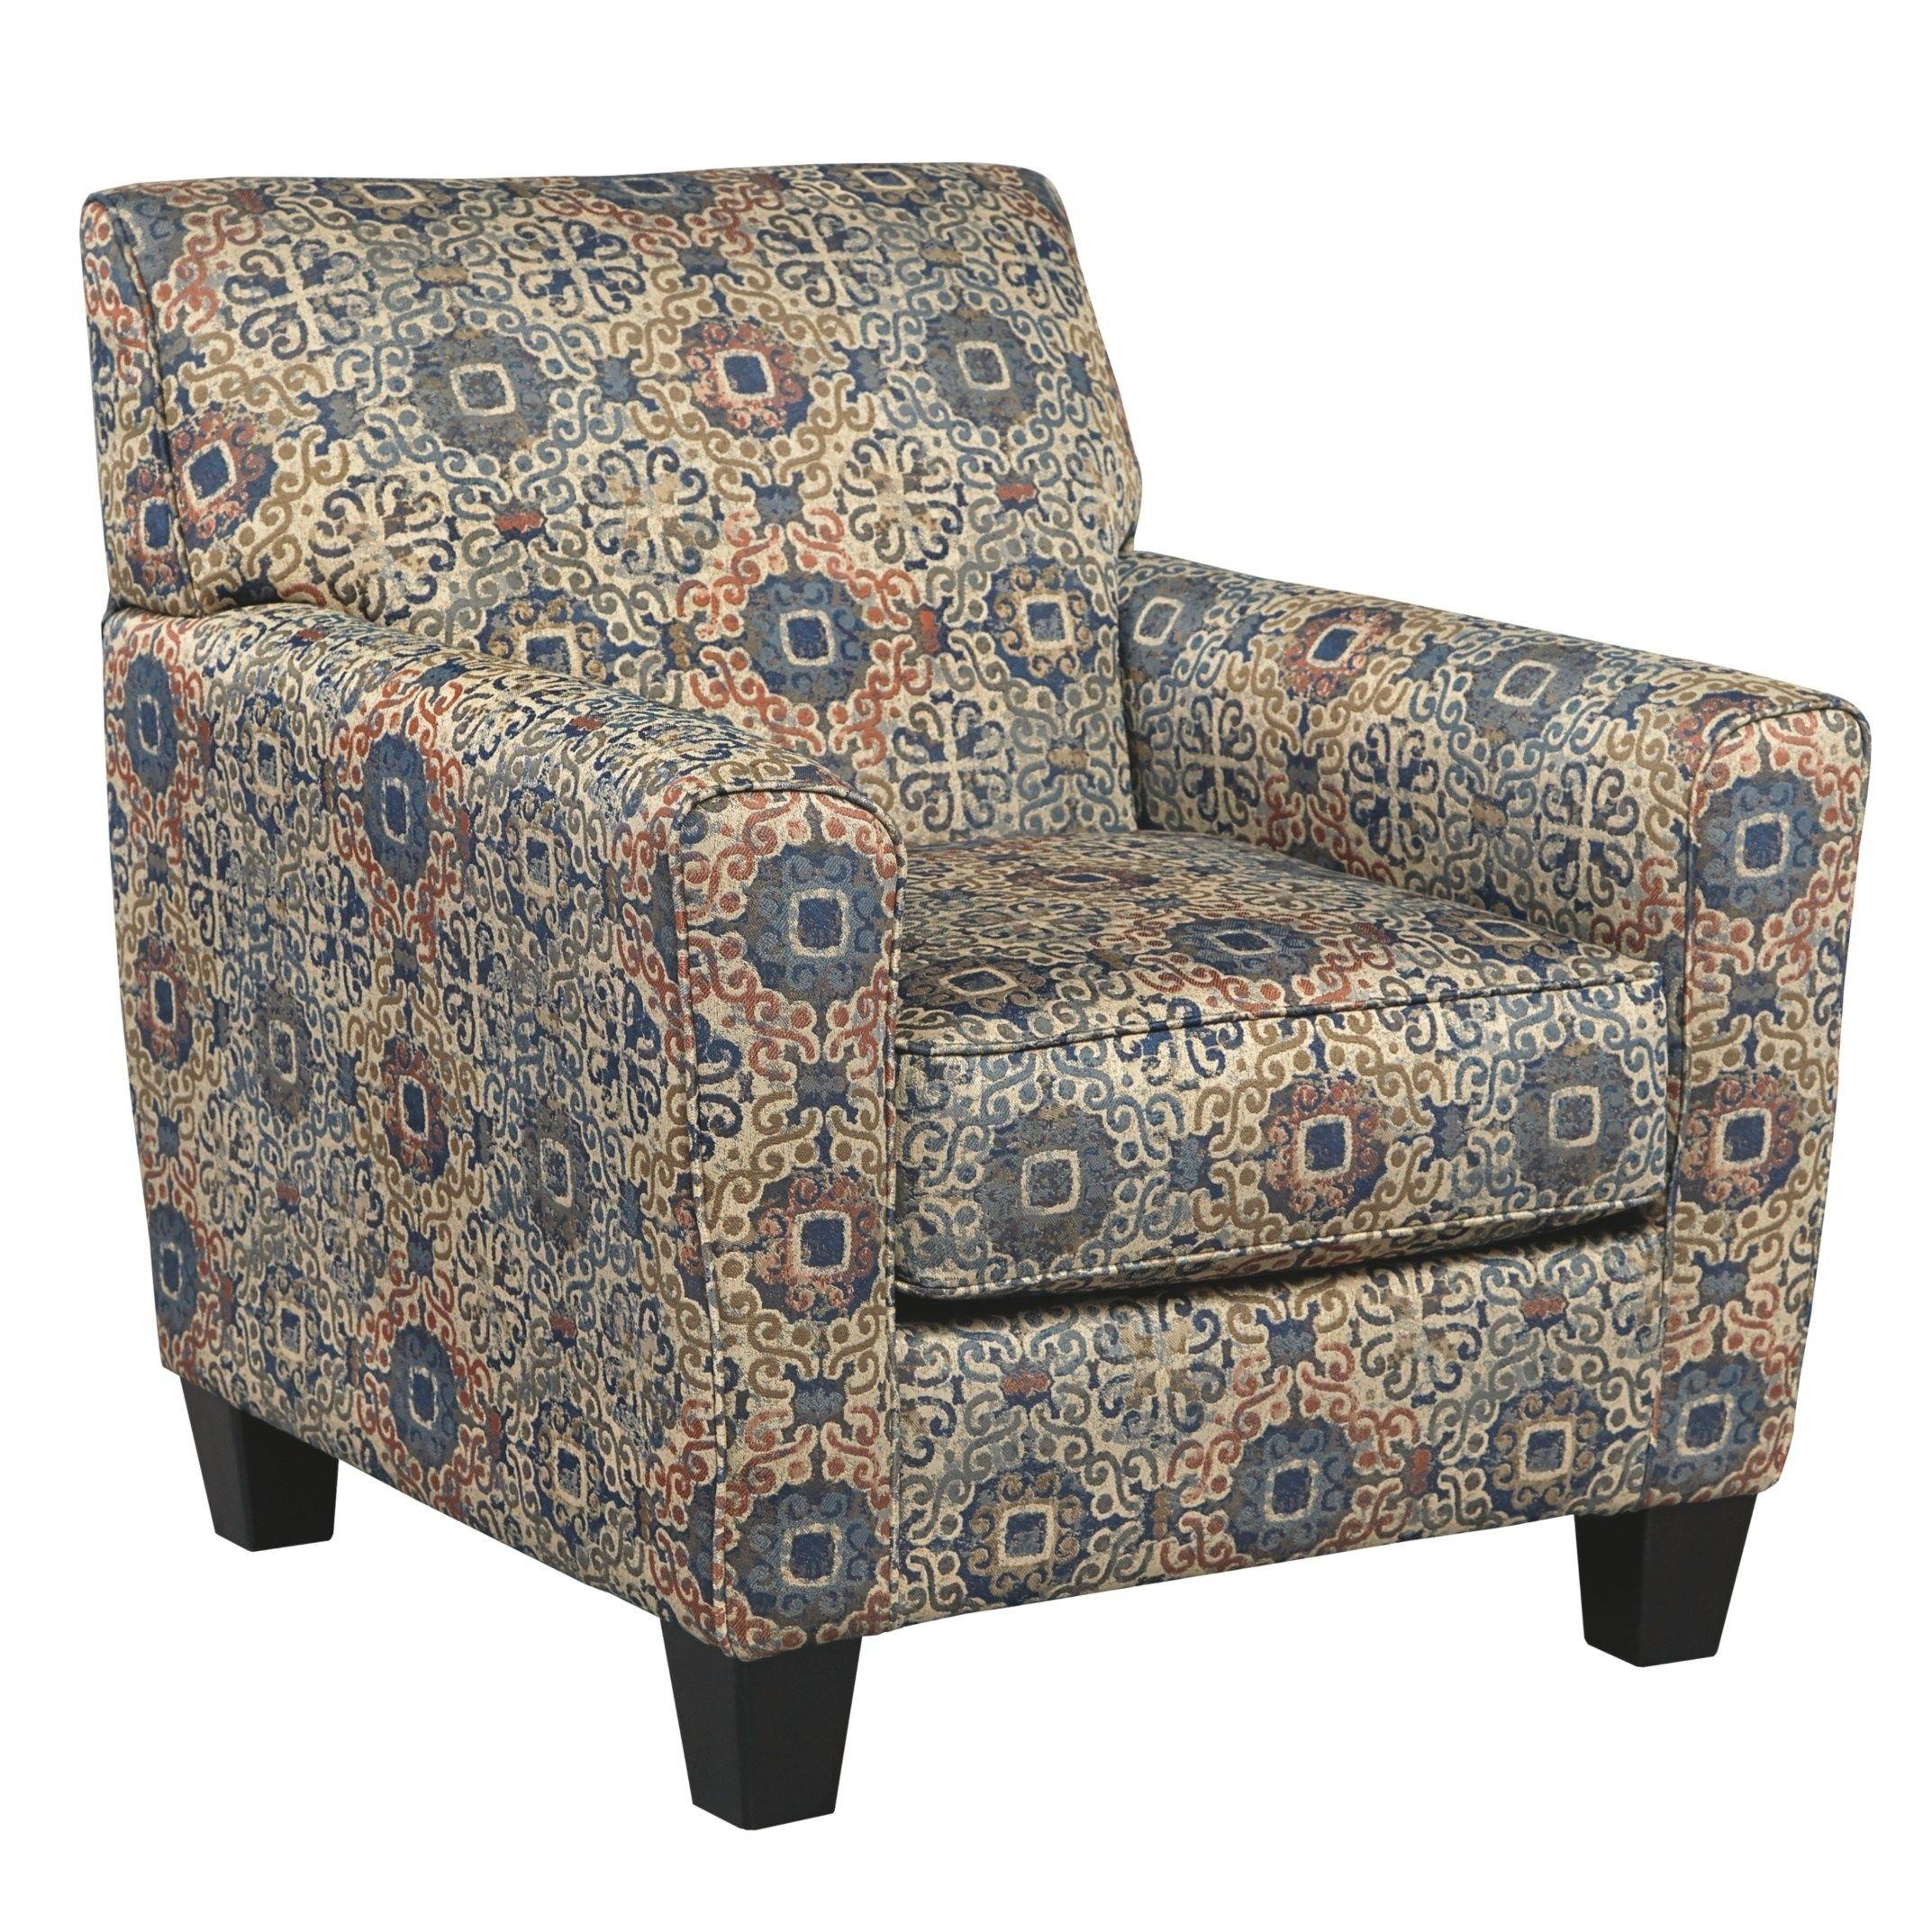 Signature Design By Ashley Belcampo Rust Fabric Chair Orange